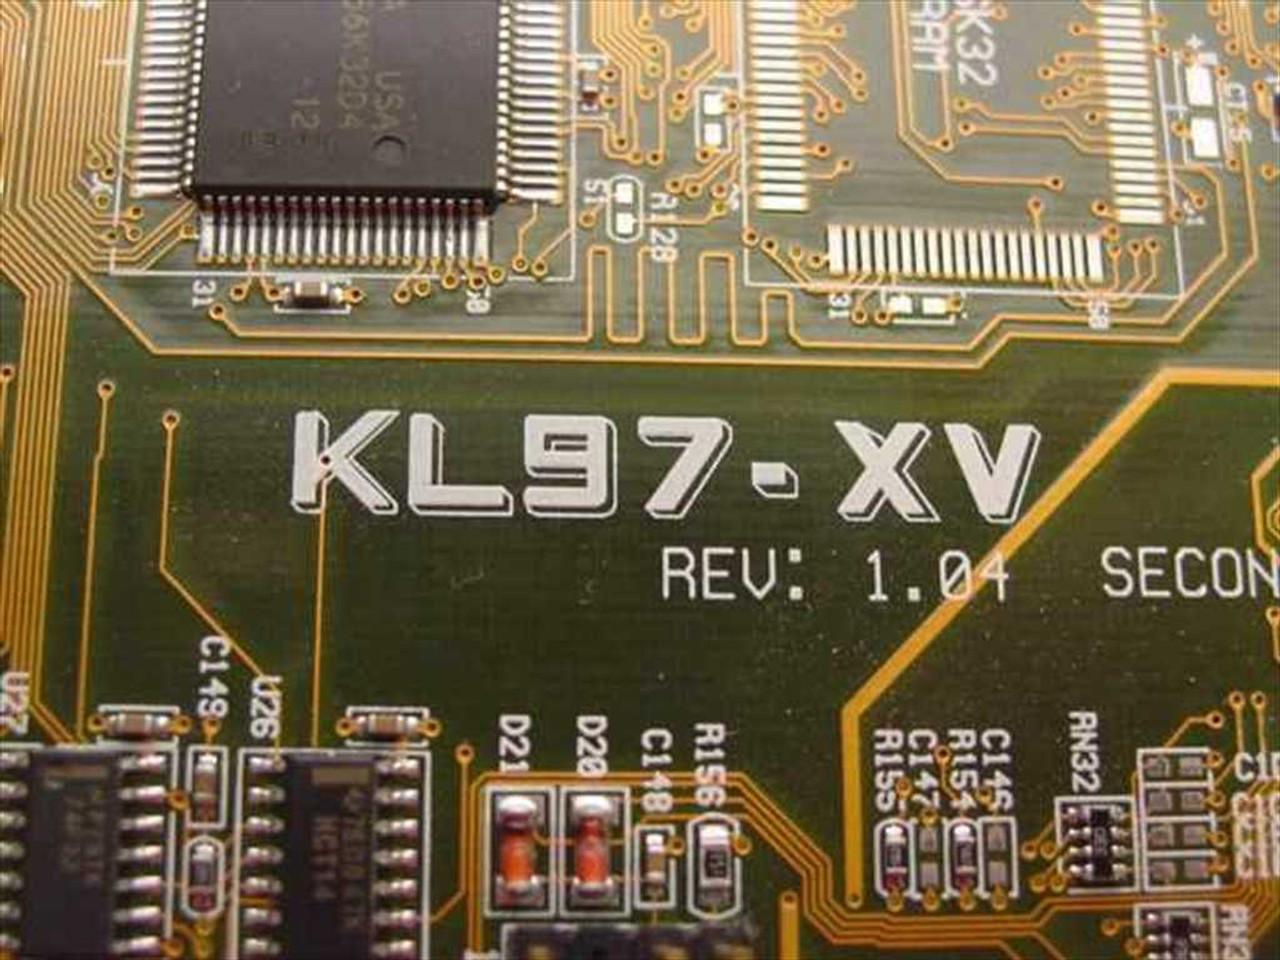 KL97 XV WINDOWS 7 X64 DRIVER